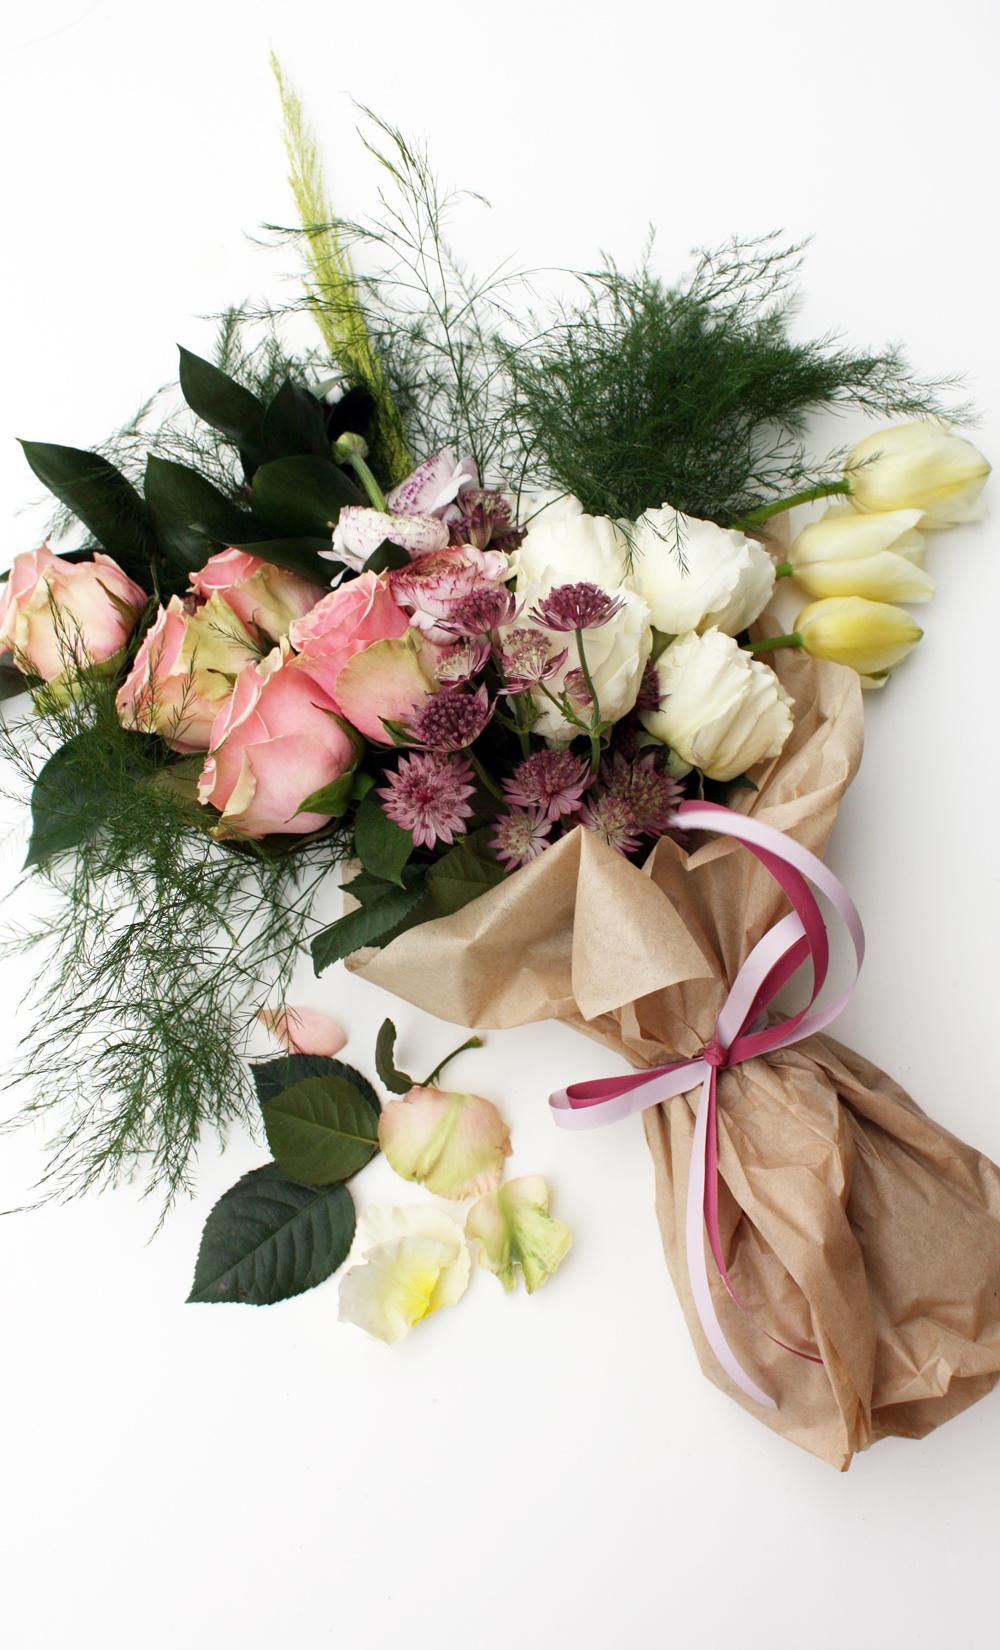 vday flowers.jpg